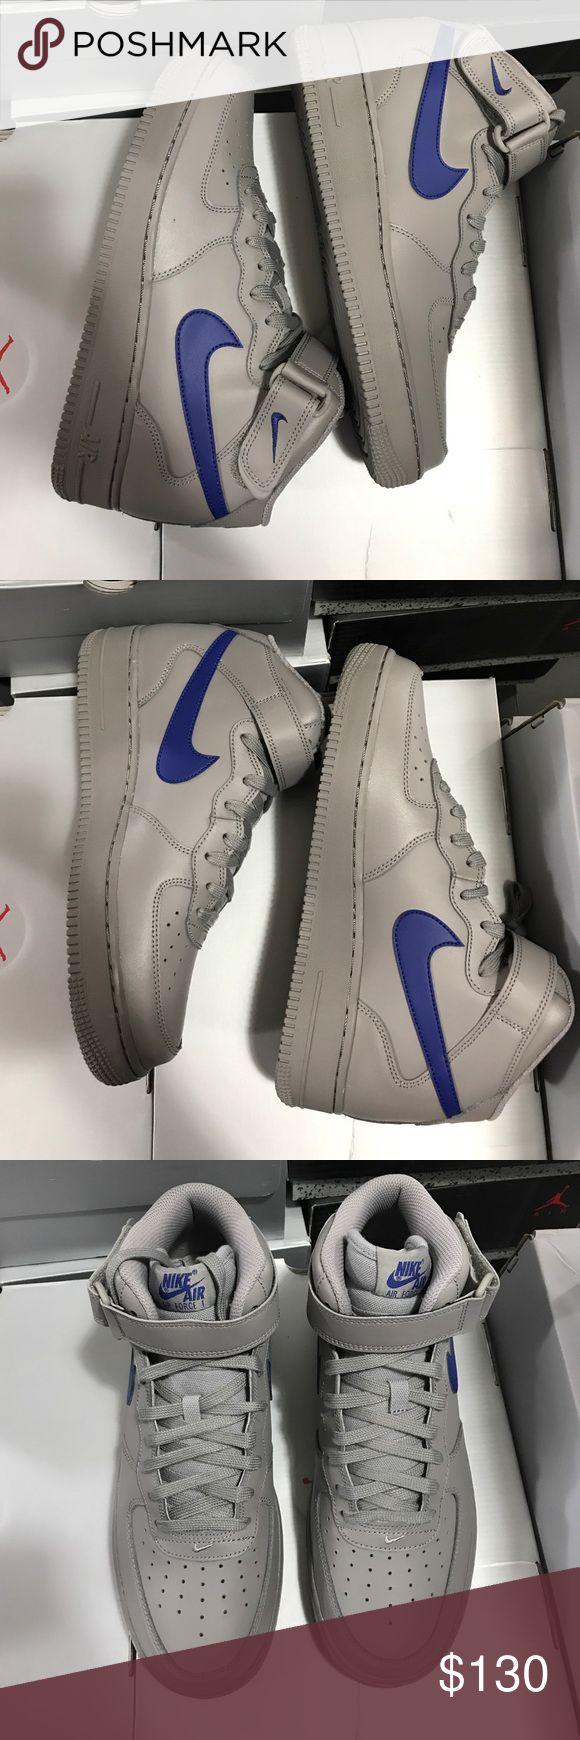 Nike Air Force 1 MID '07 2017 Dust/Deep Royal Blue Nike Shoes Sneakers